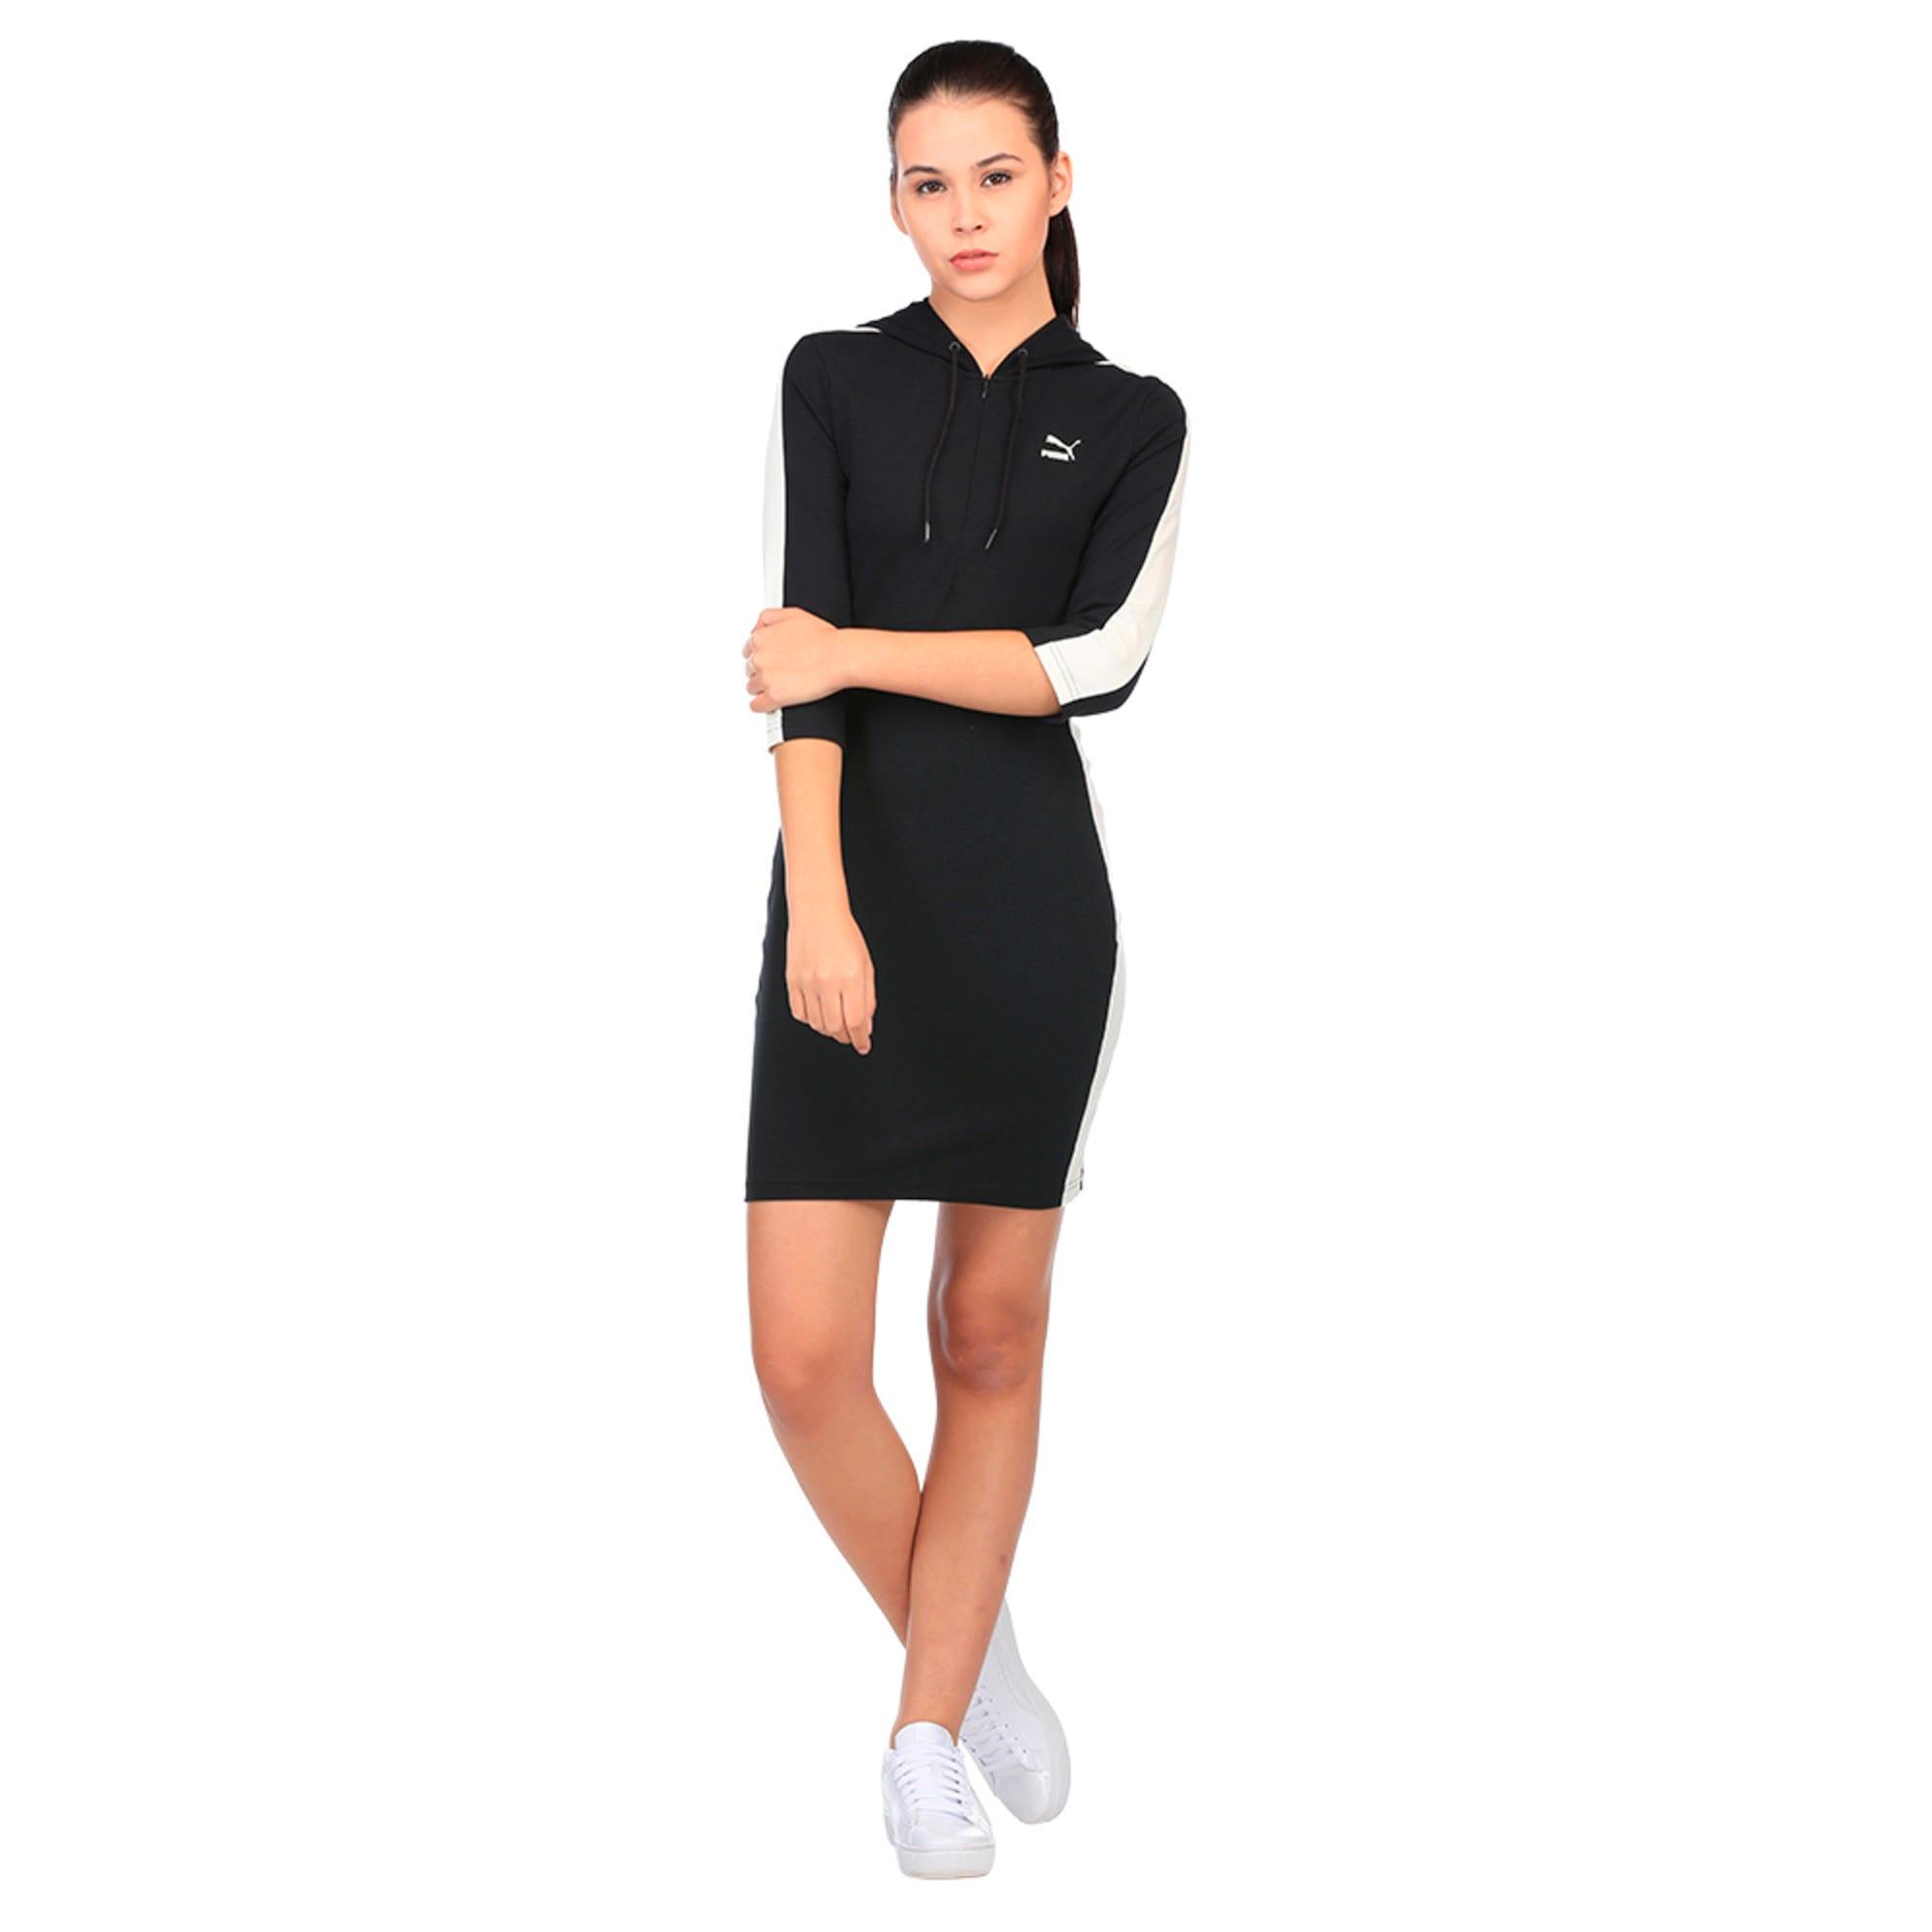 Thumbnail 3 of Archive Women's T7 Dress, Puma Black, medium-IND